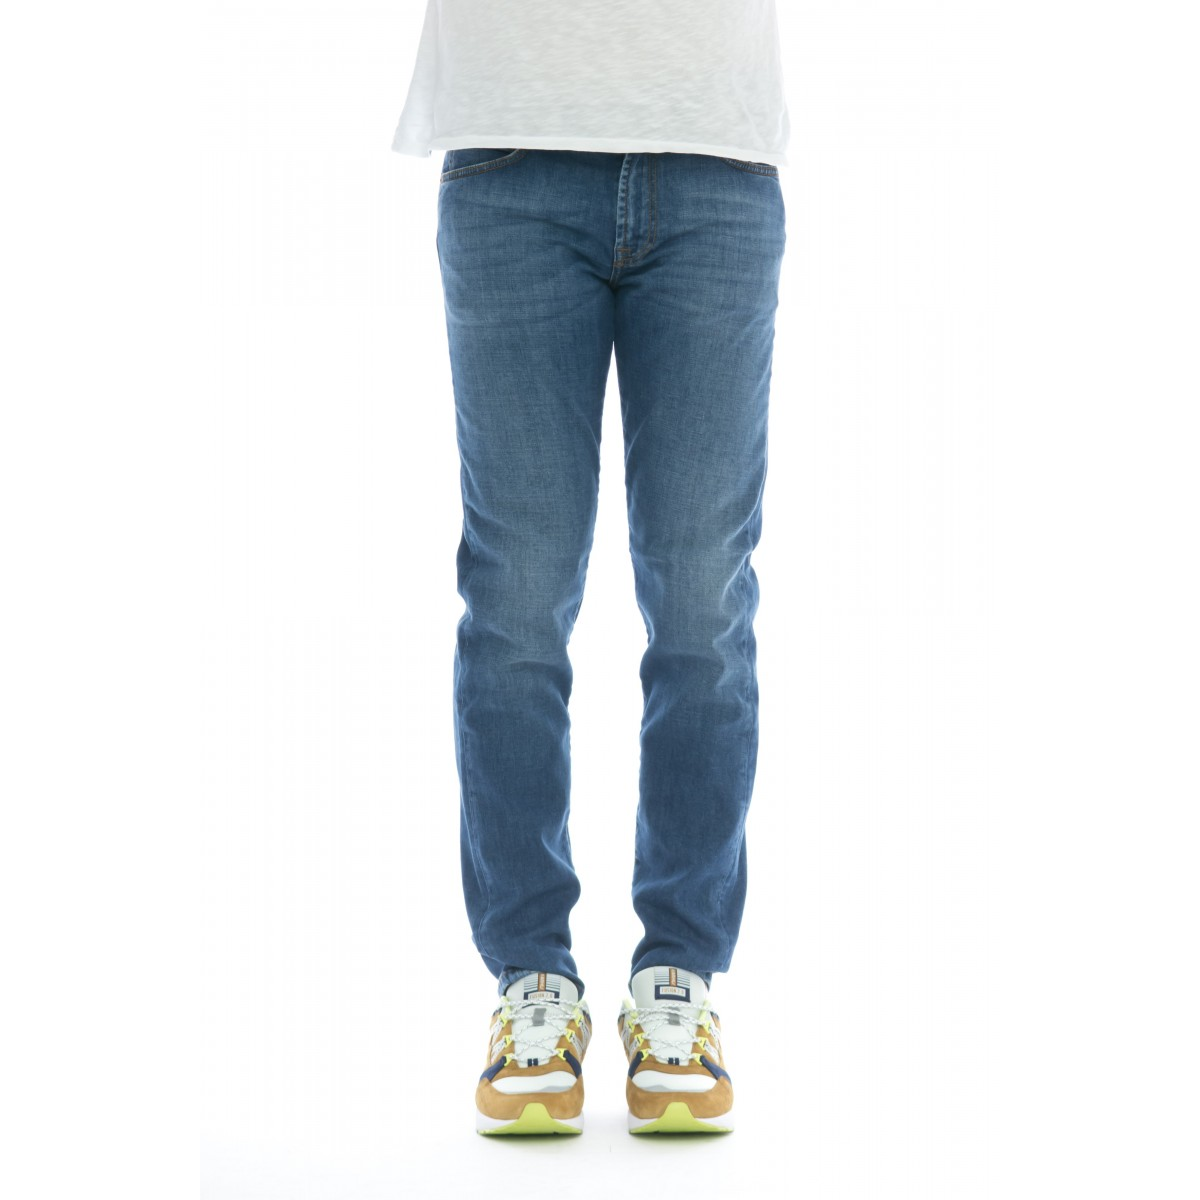 Jeans - 517 nick